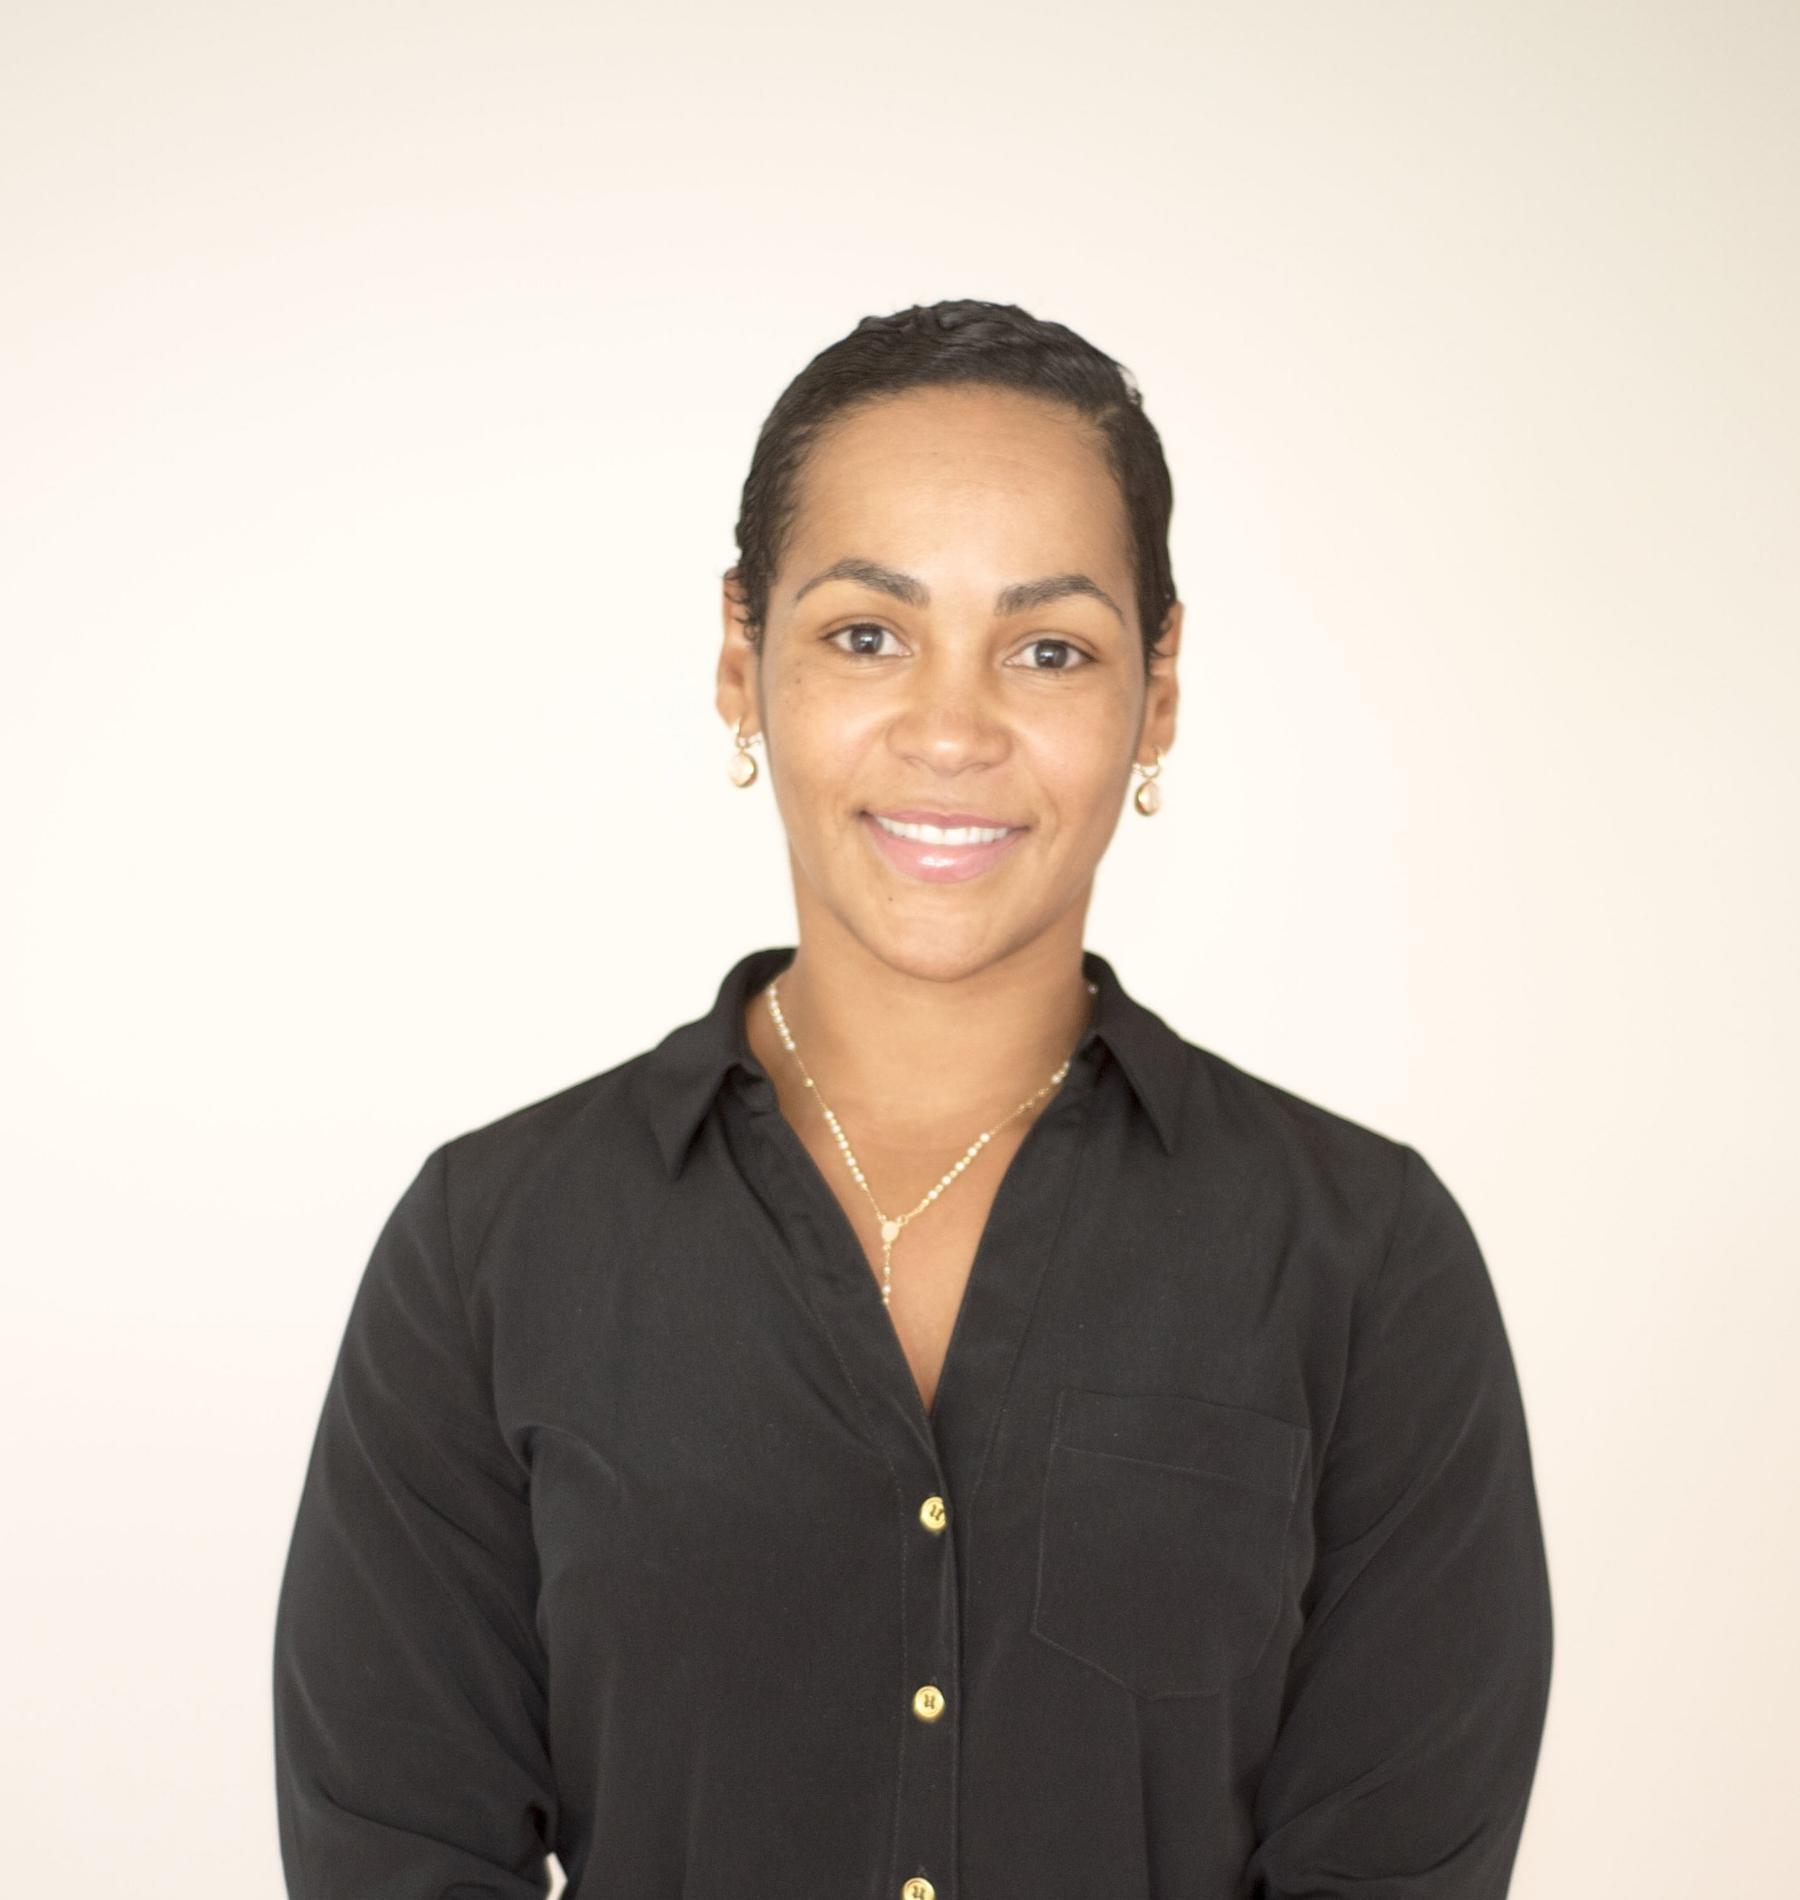 GAELLE WOOLLEY   Legal Administrator  Gaellew@jotlawfirm.net